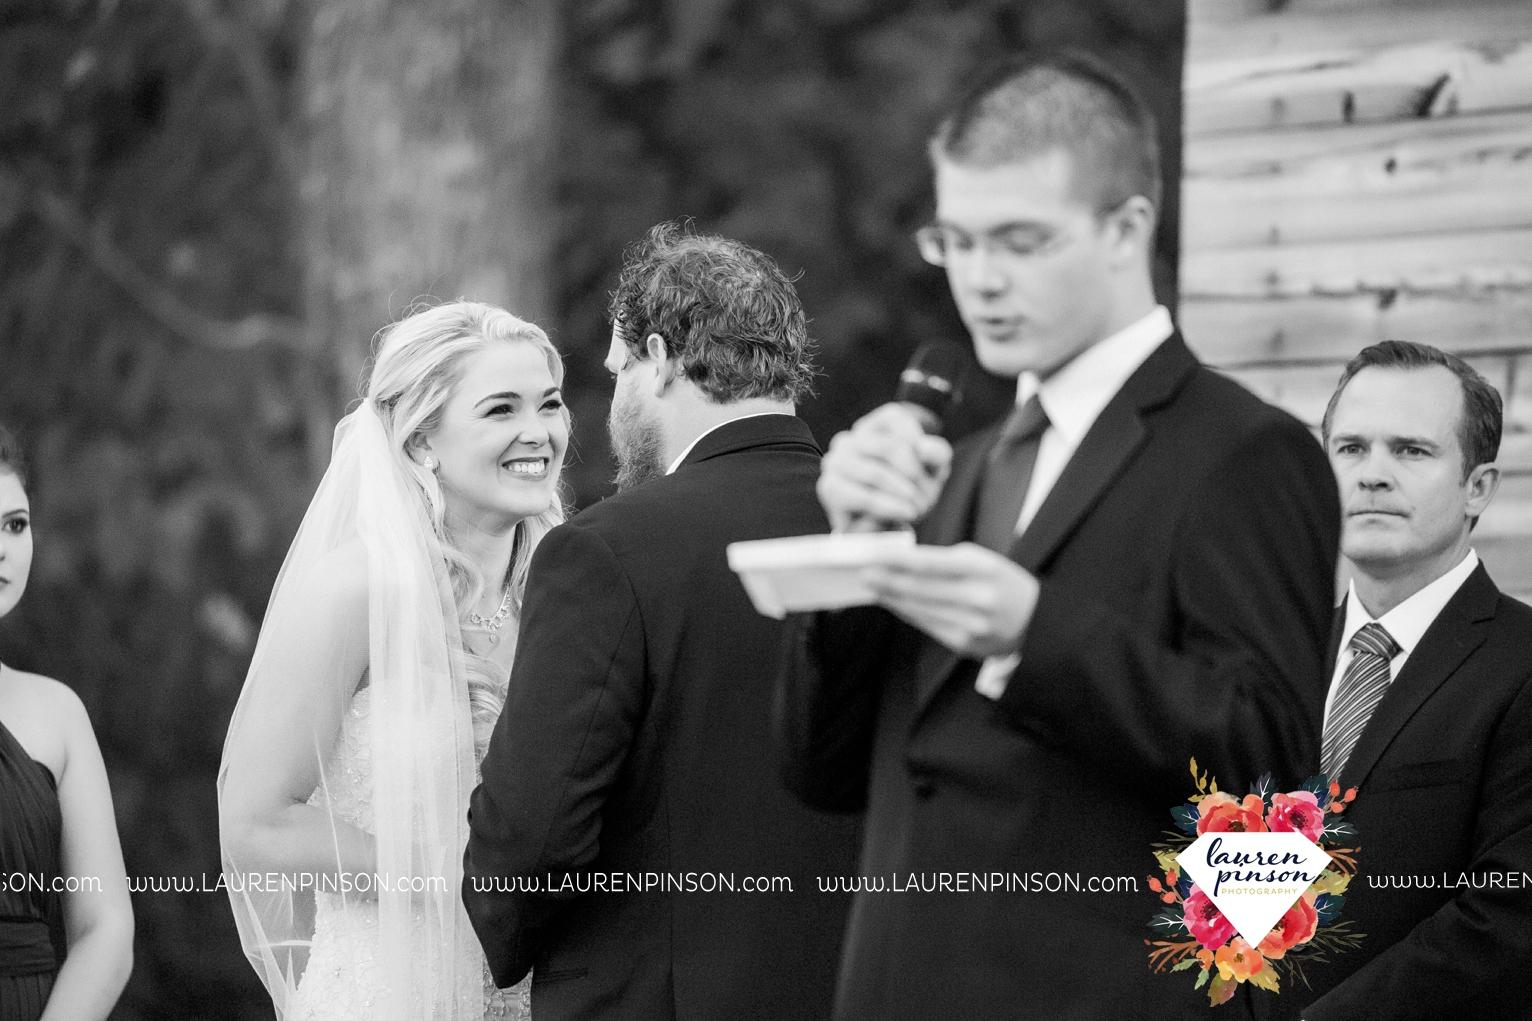 rustic-wichita-falls-texas-wedding-photographer-gold-glam-mayfield-events-market-street-united-allue-bridals-fall_1685.jpg